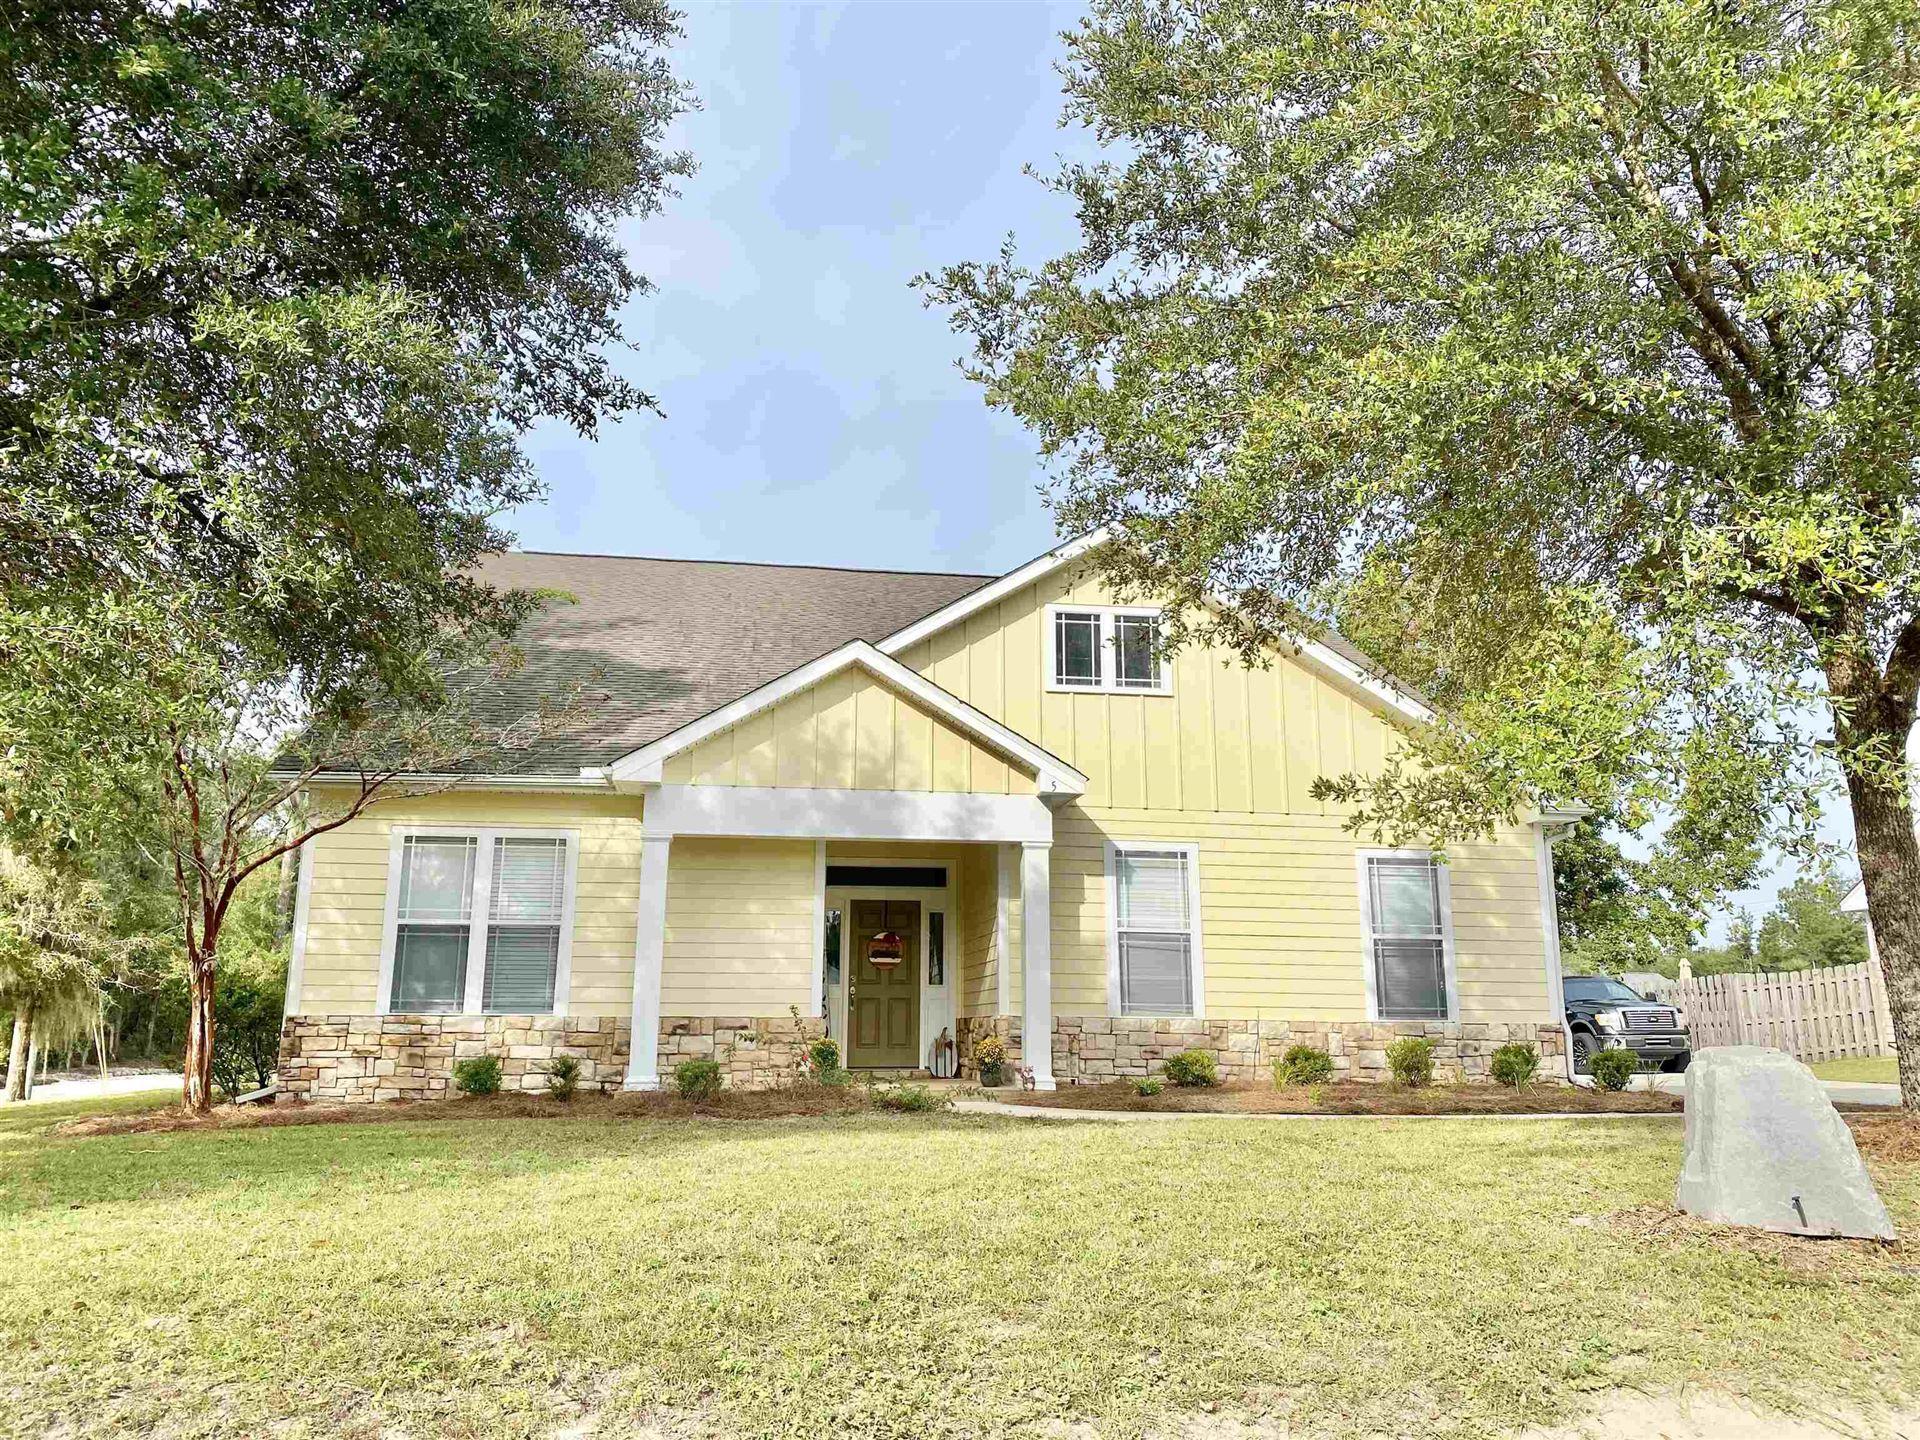 5 Savannah Forest Circle, Crawfordville, FL 32327 - MLS#: 338597